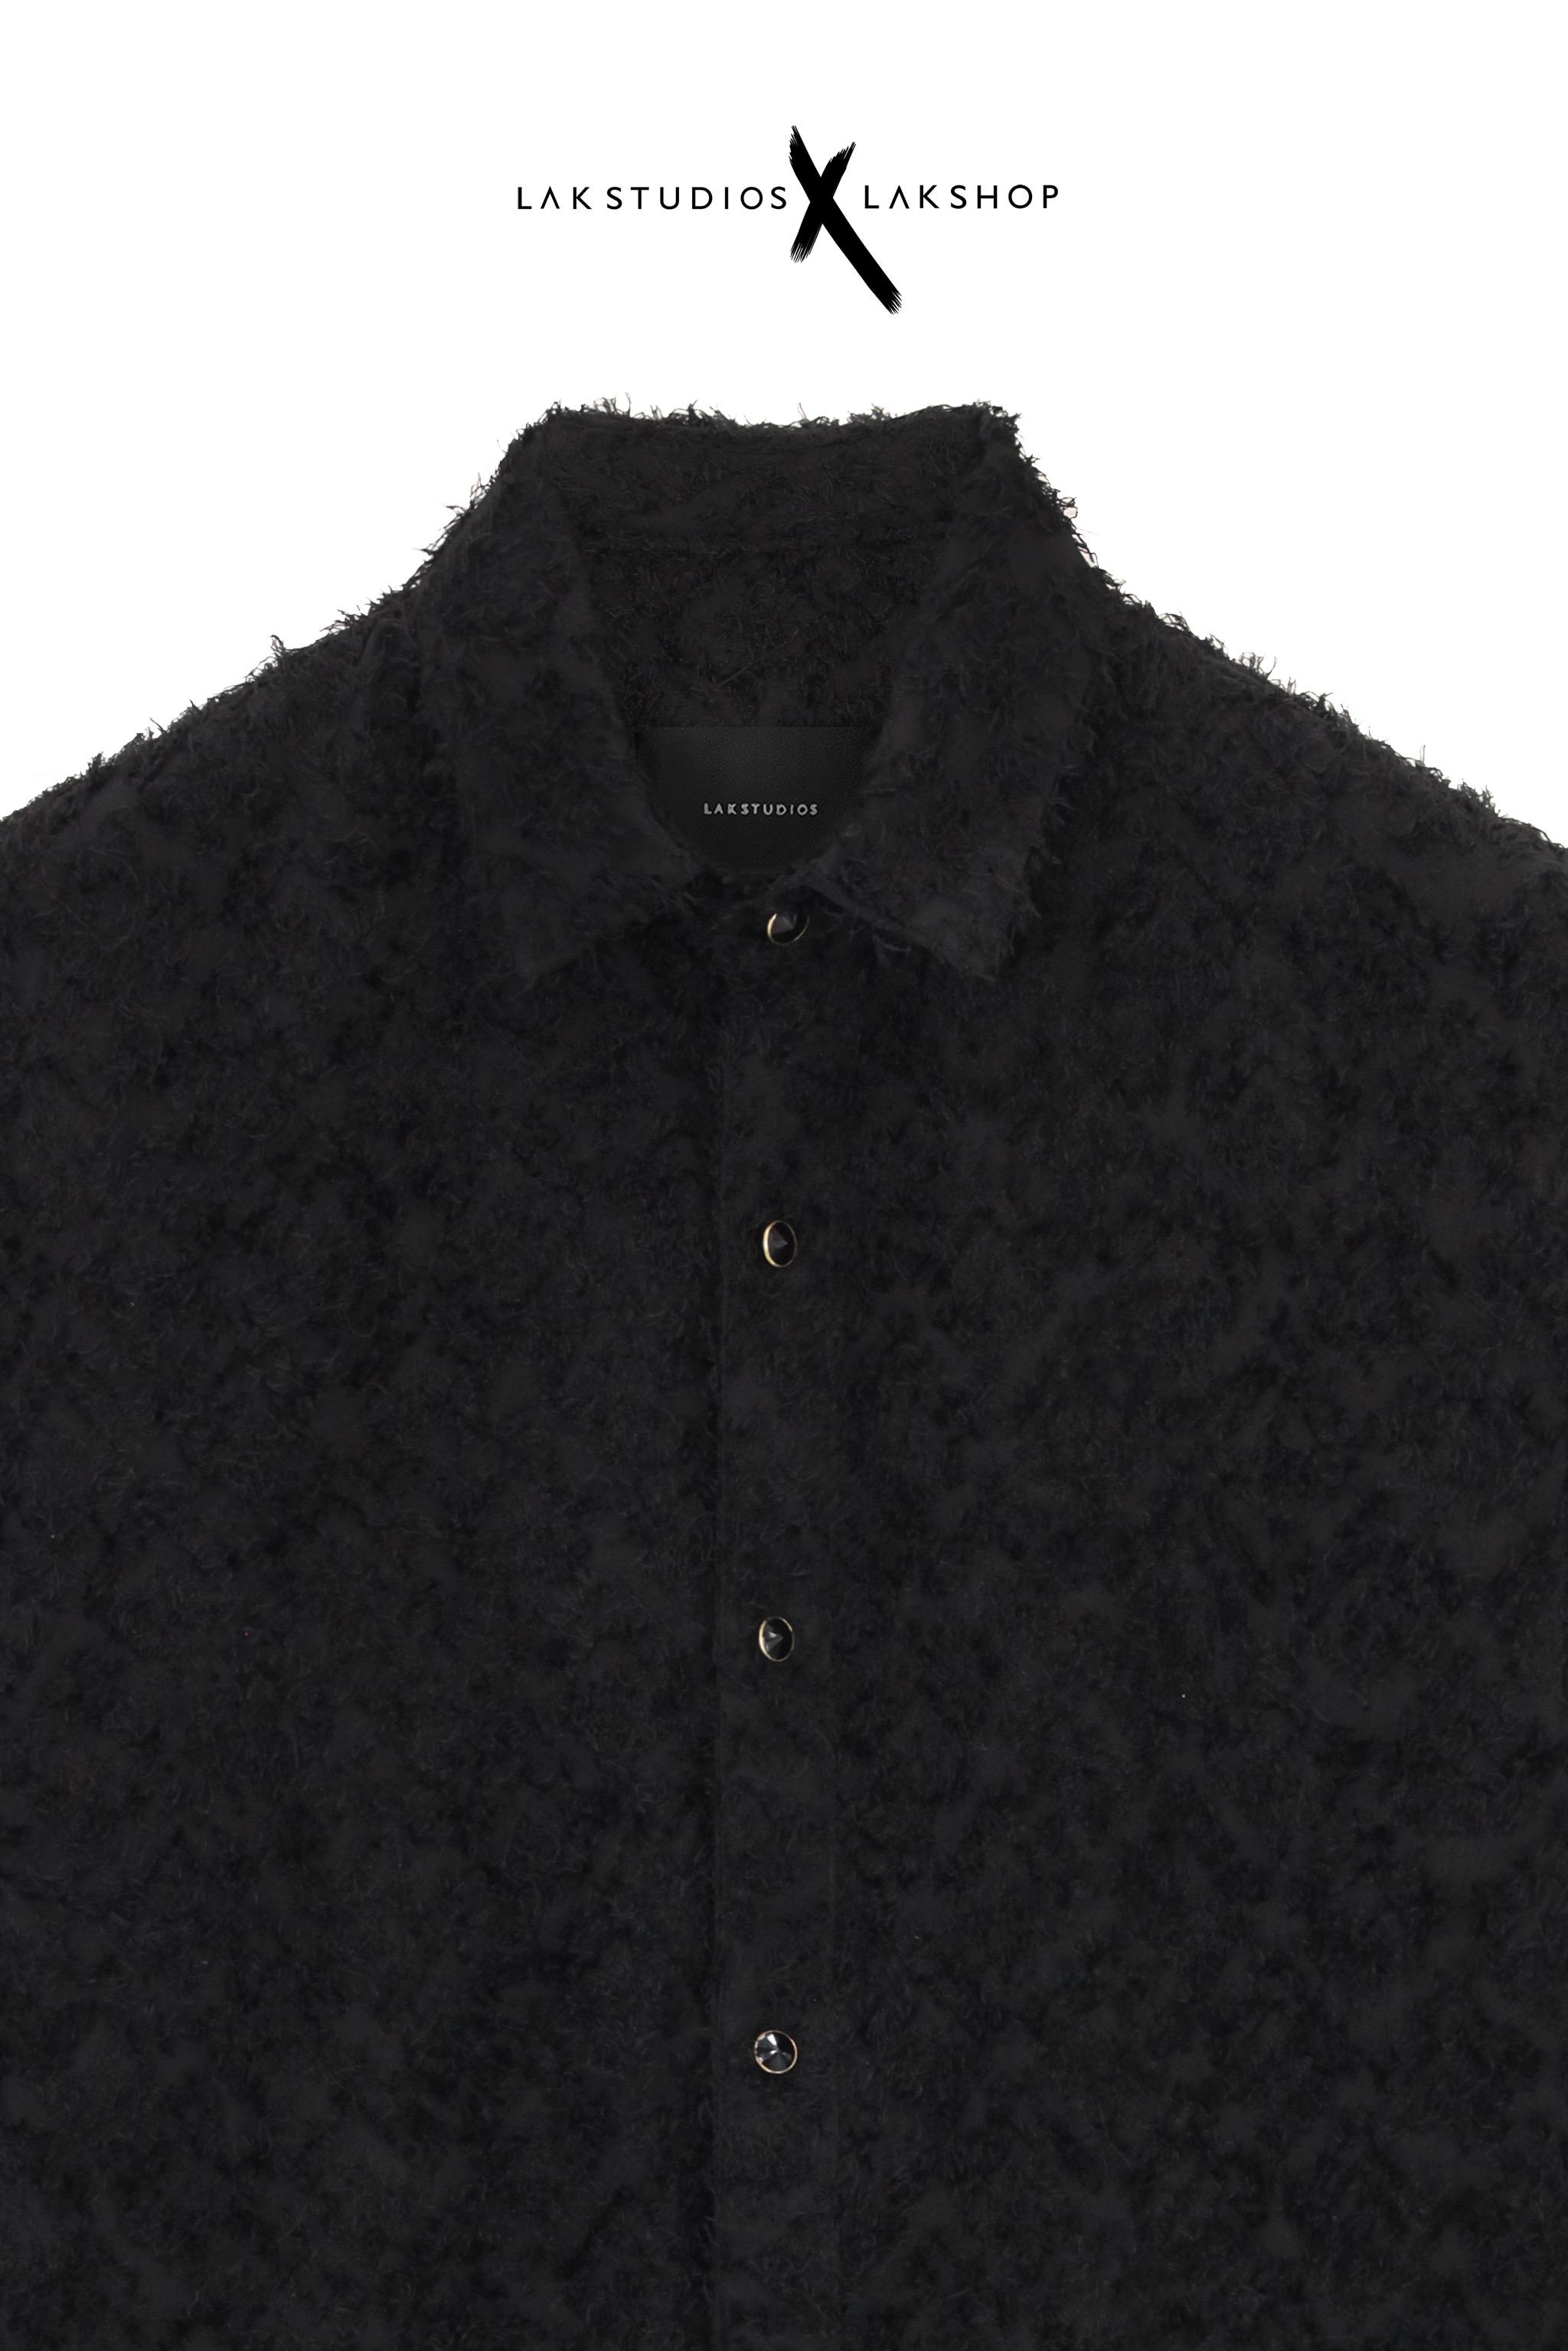 Lak Studios Black Glitter Tweed Short Sleeve Shirt